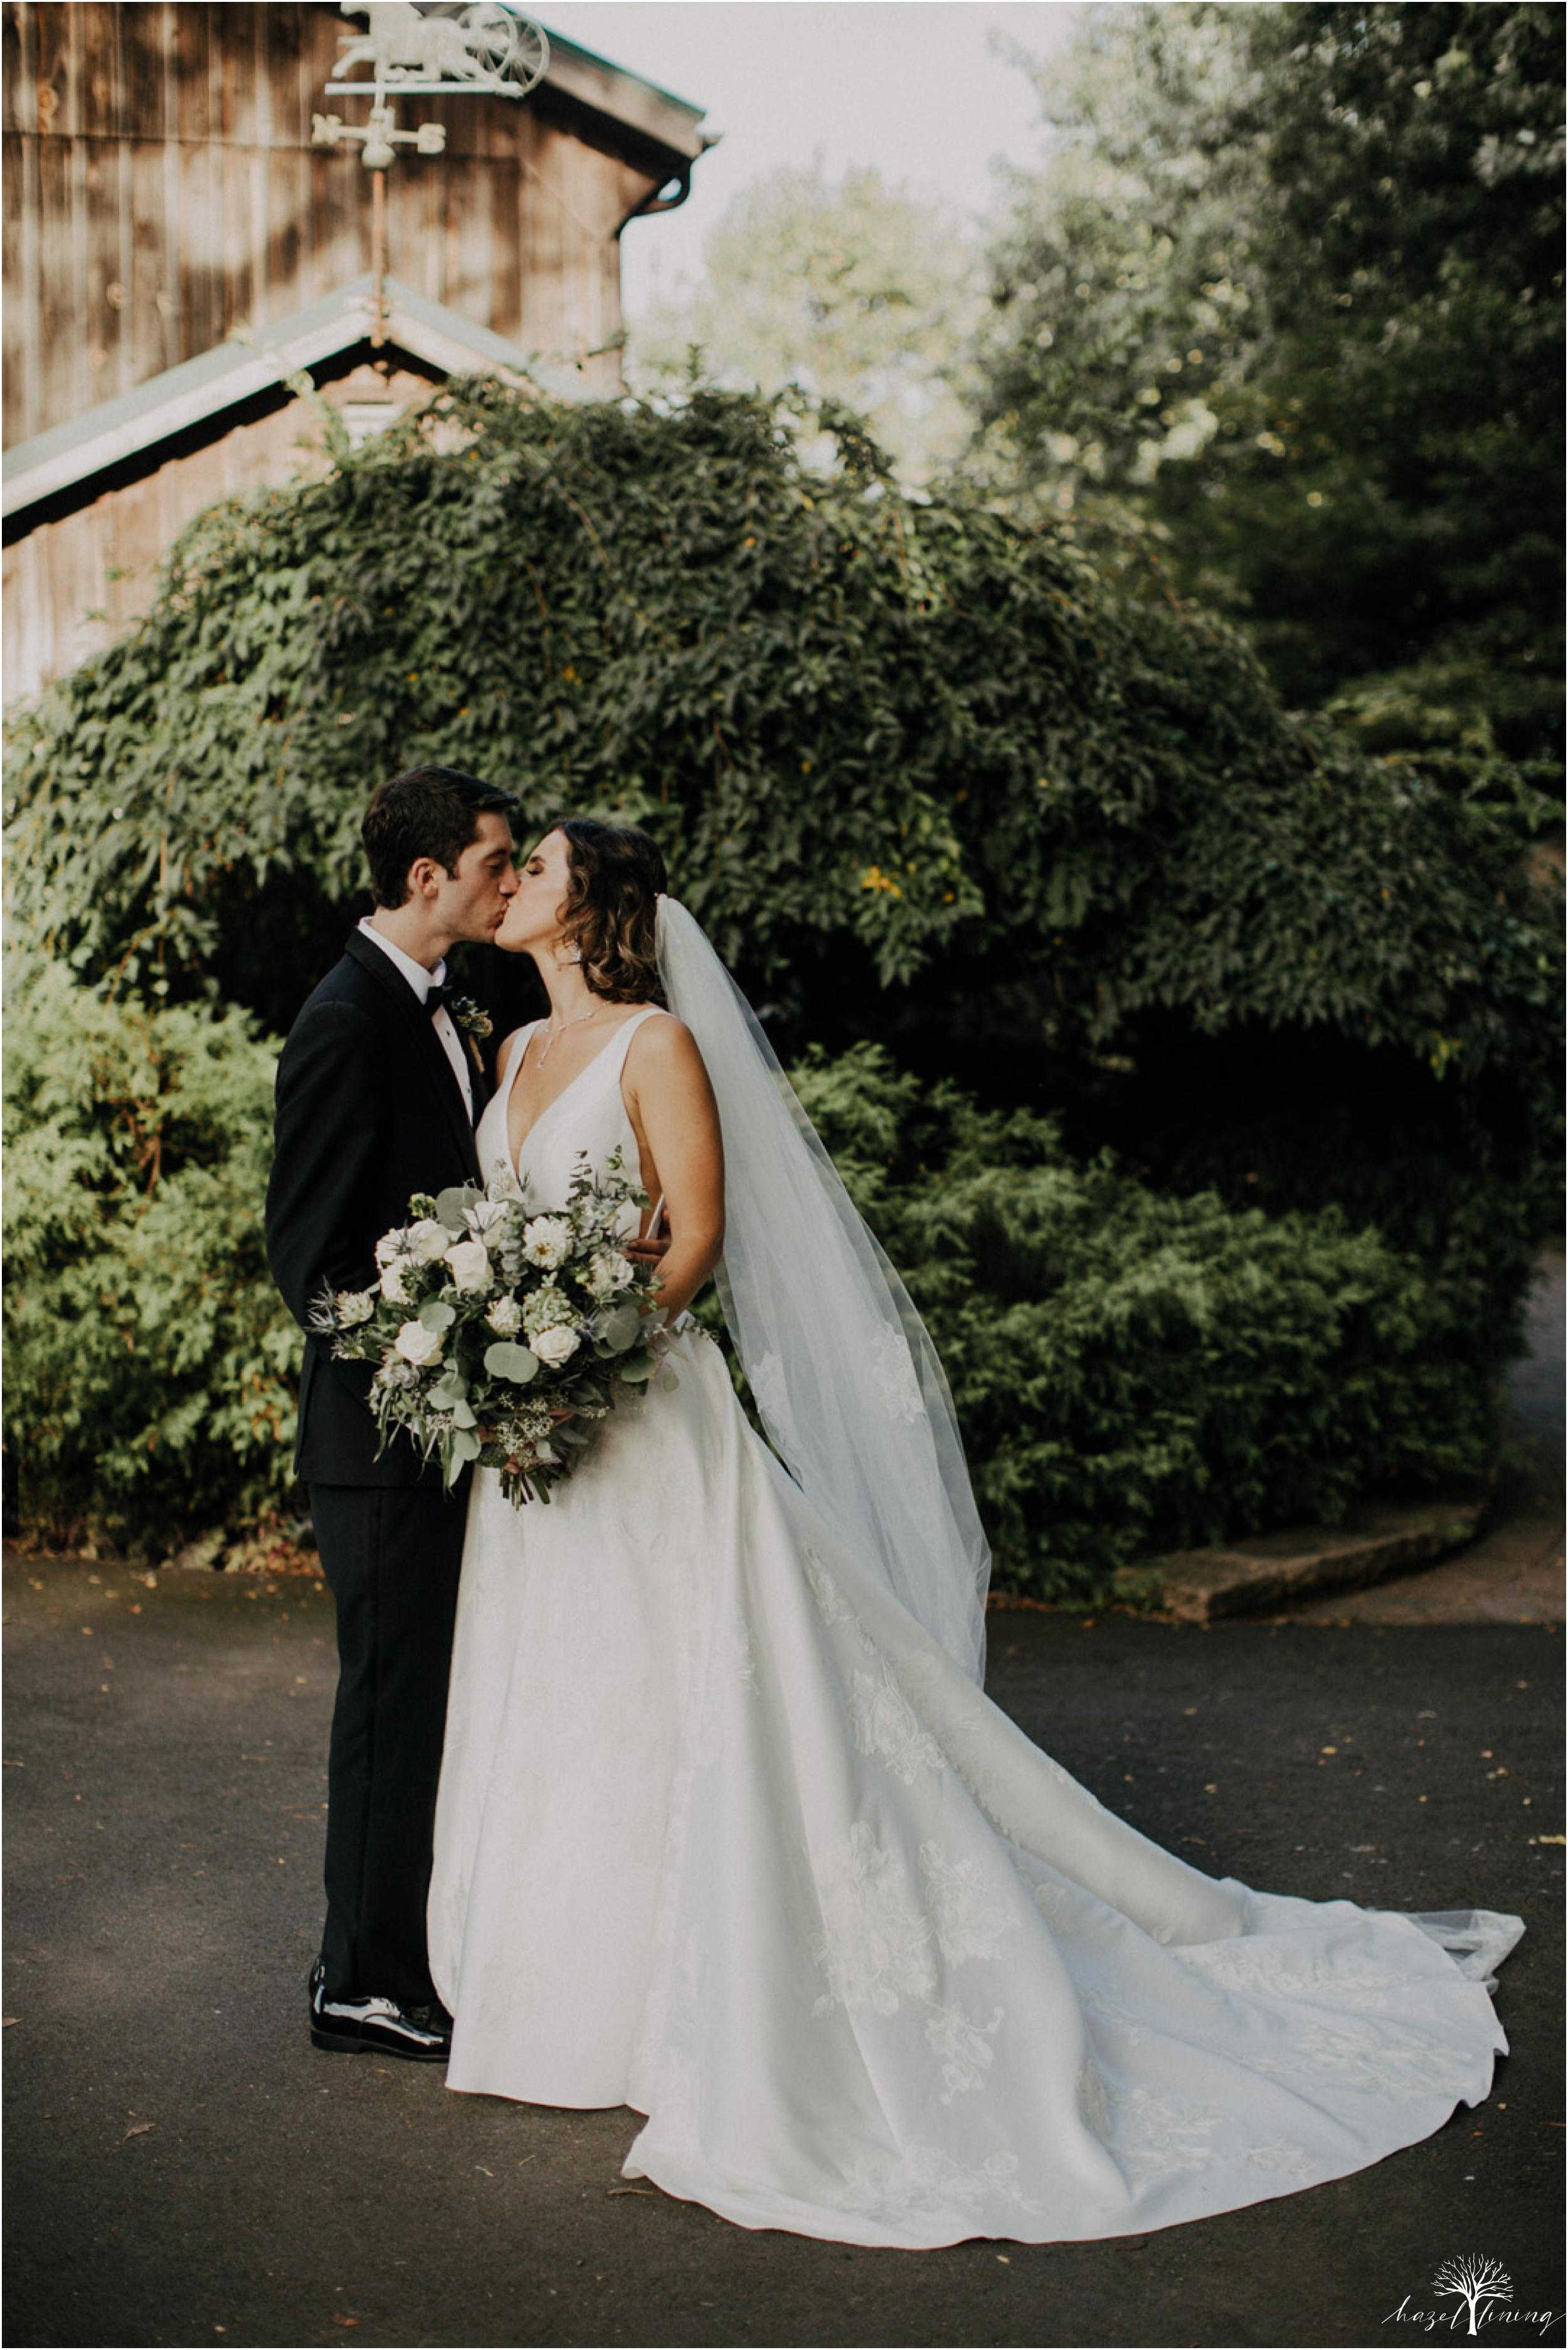 maureen-hepner-anthony-giordano-rose-bank-winery-newtow-pennsylvania-luxury-summer-wedding-hazel-lining-photography-destination-elopement-wedding-engagement-photography_0102.jpg